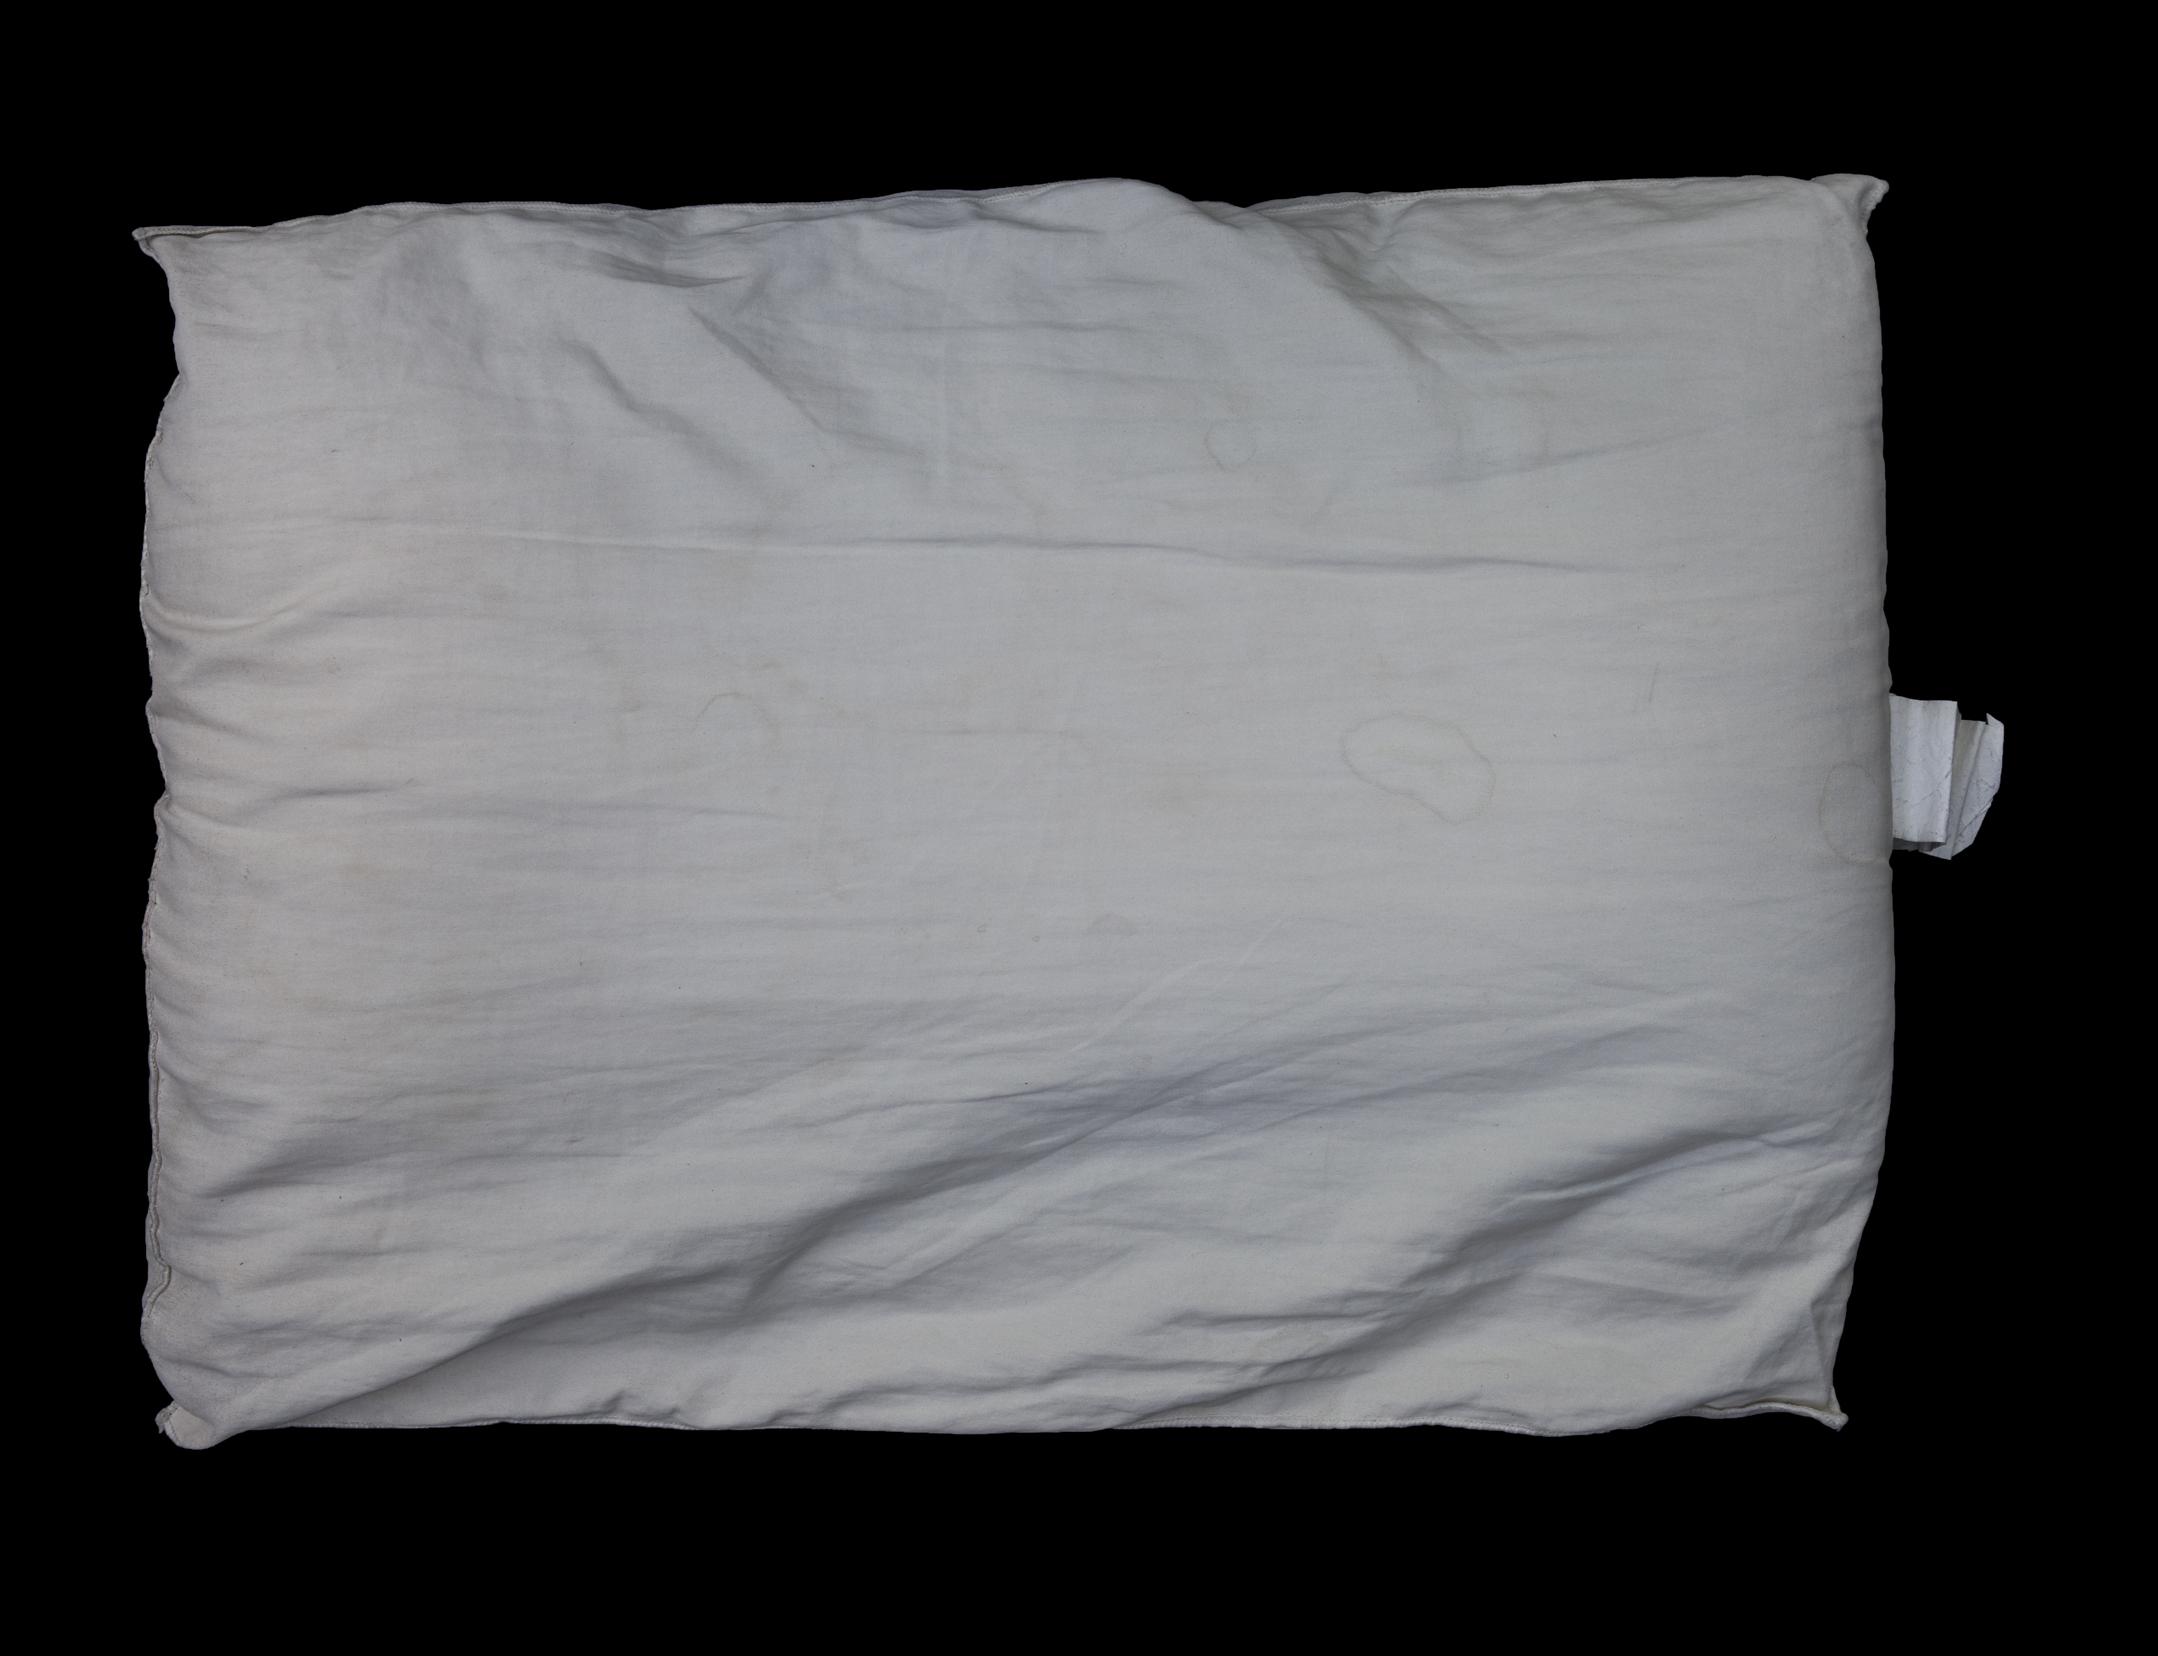 pillowno7.jpg